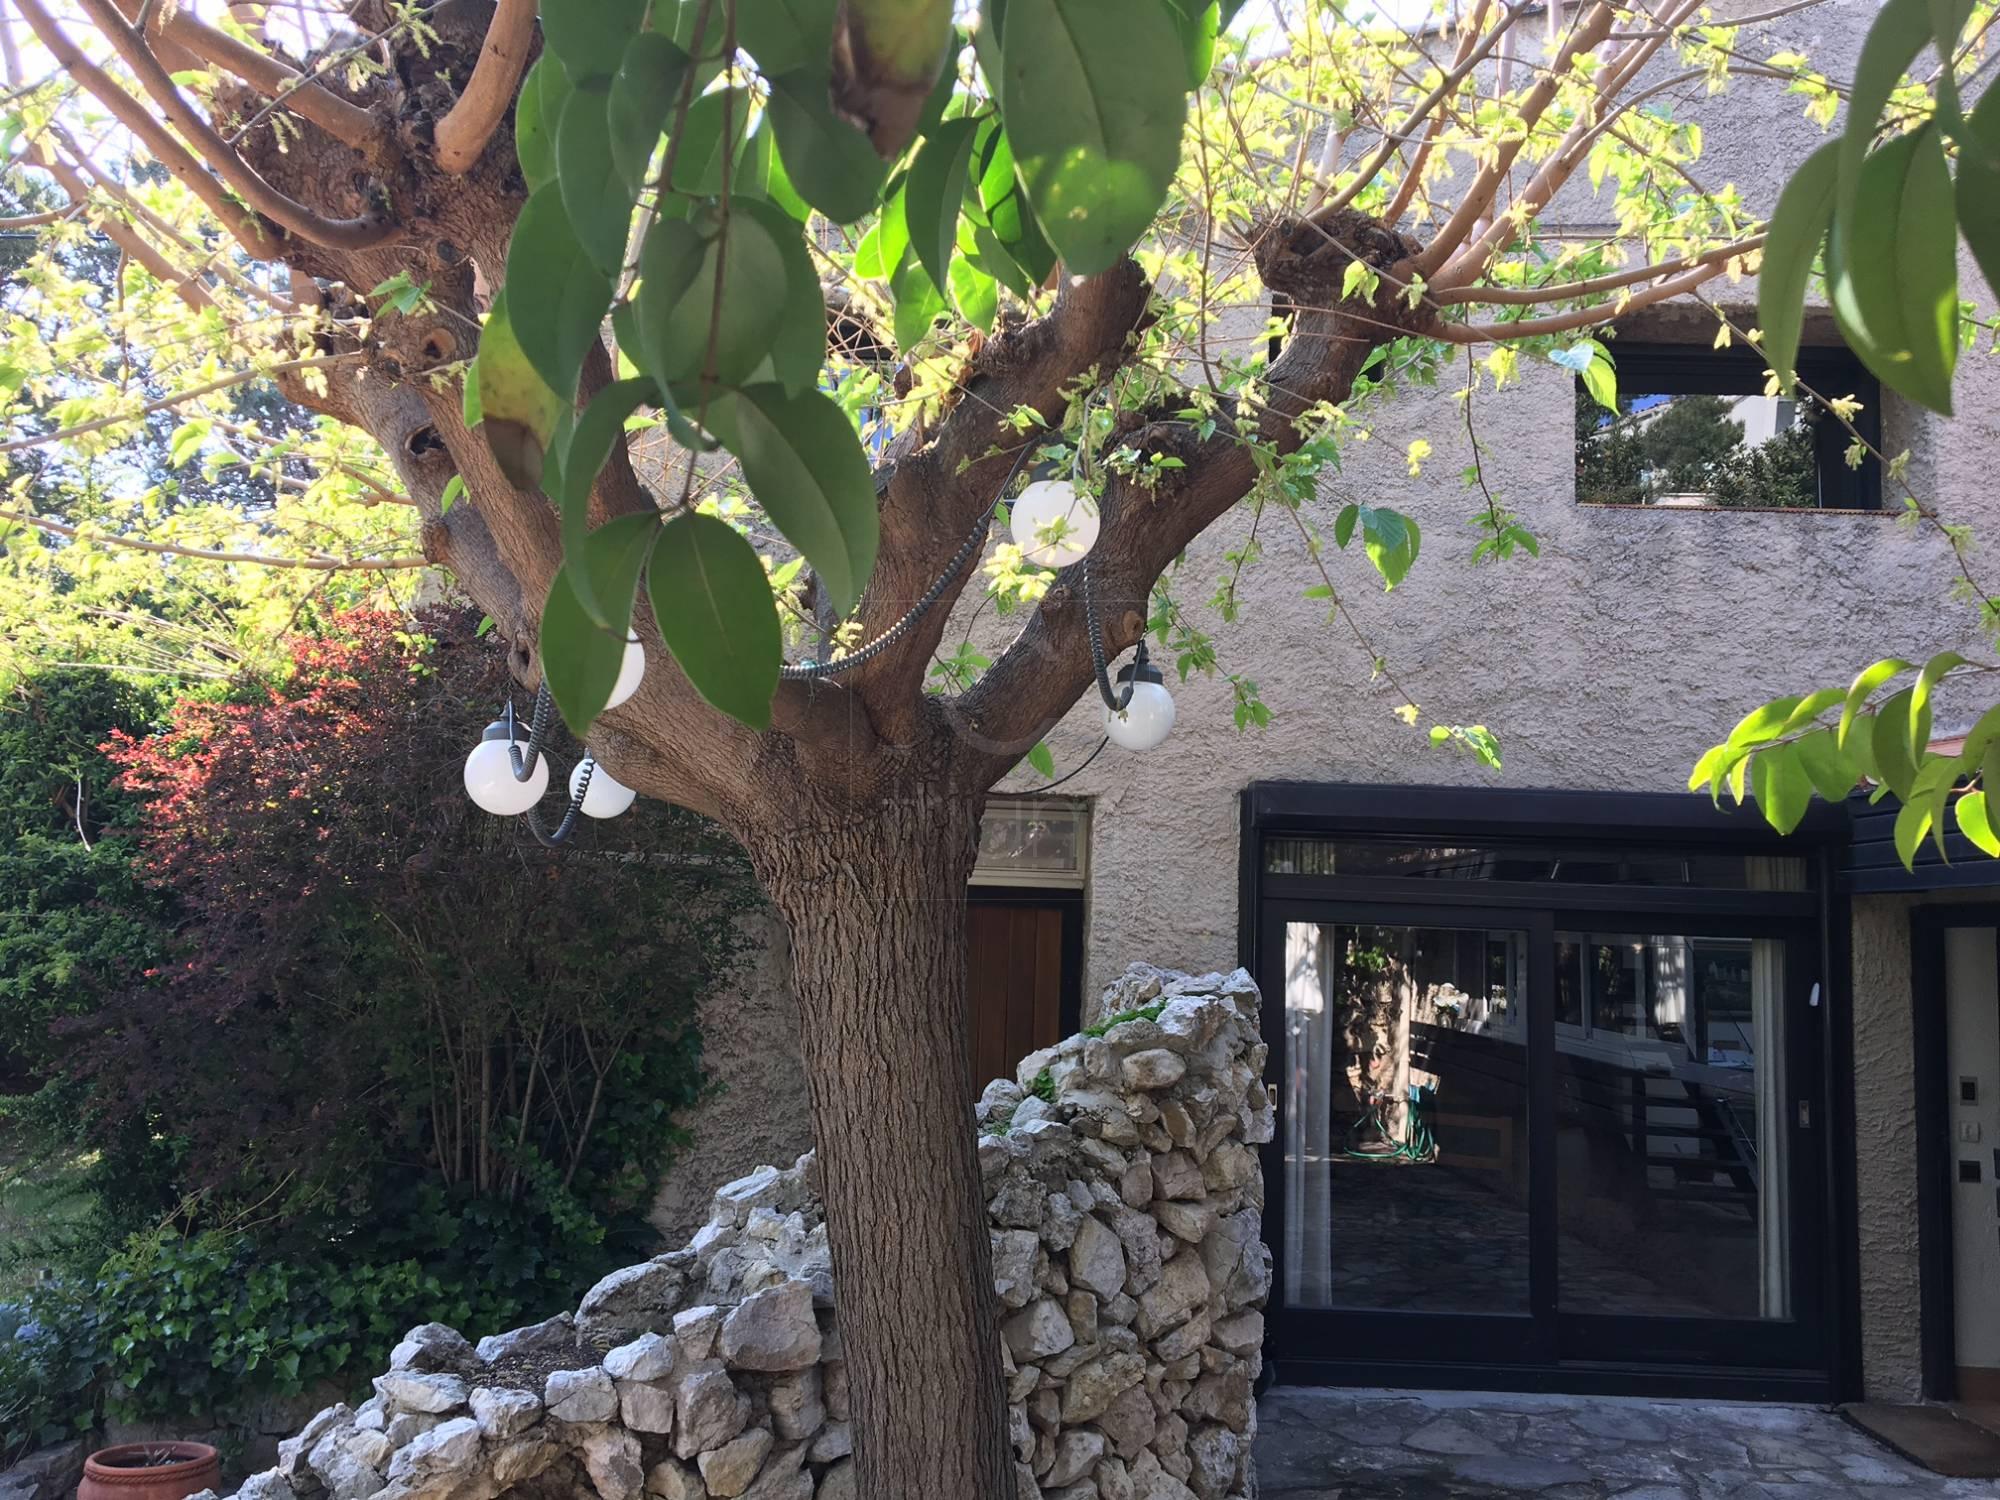 Vente maison marseille 7e jardin terrasse parking t5 f5 marseille endoume place st eug ne agence - Agence immobiliere terrasse et jardin ...